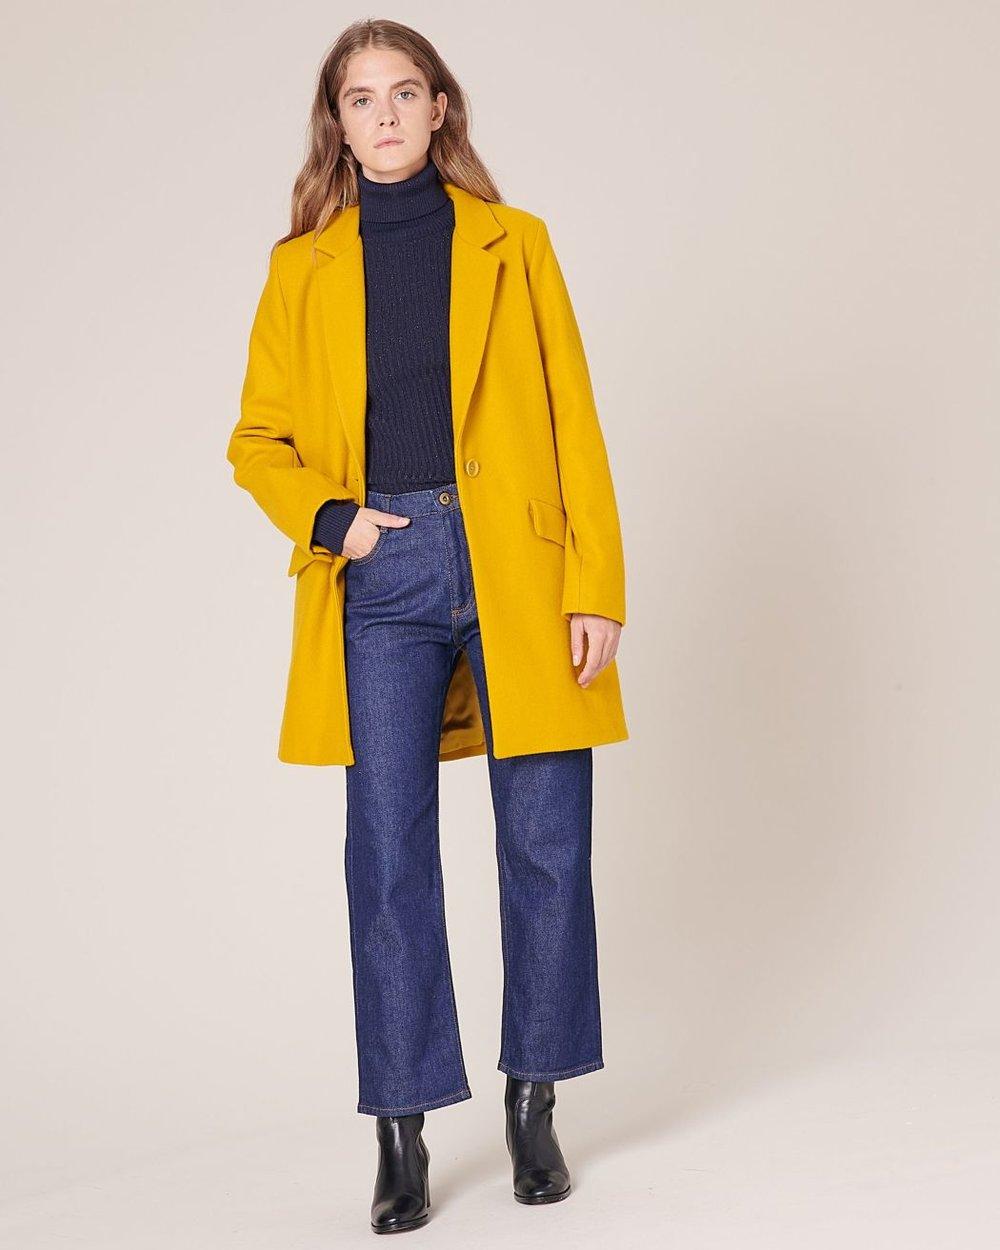 Yellow wool coat from Sessùn